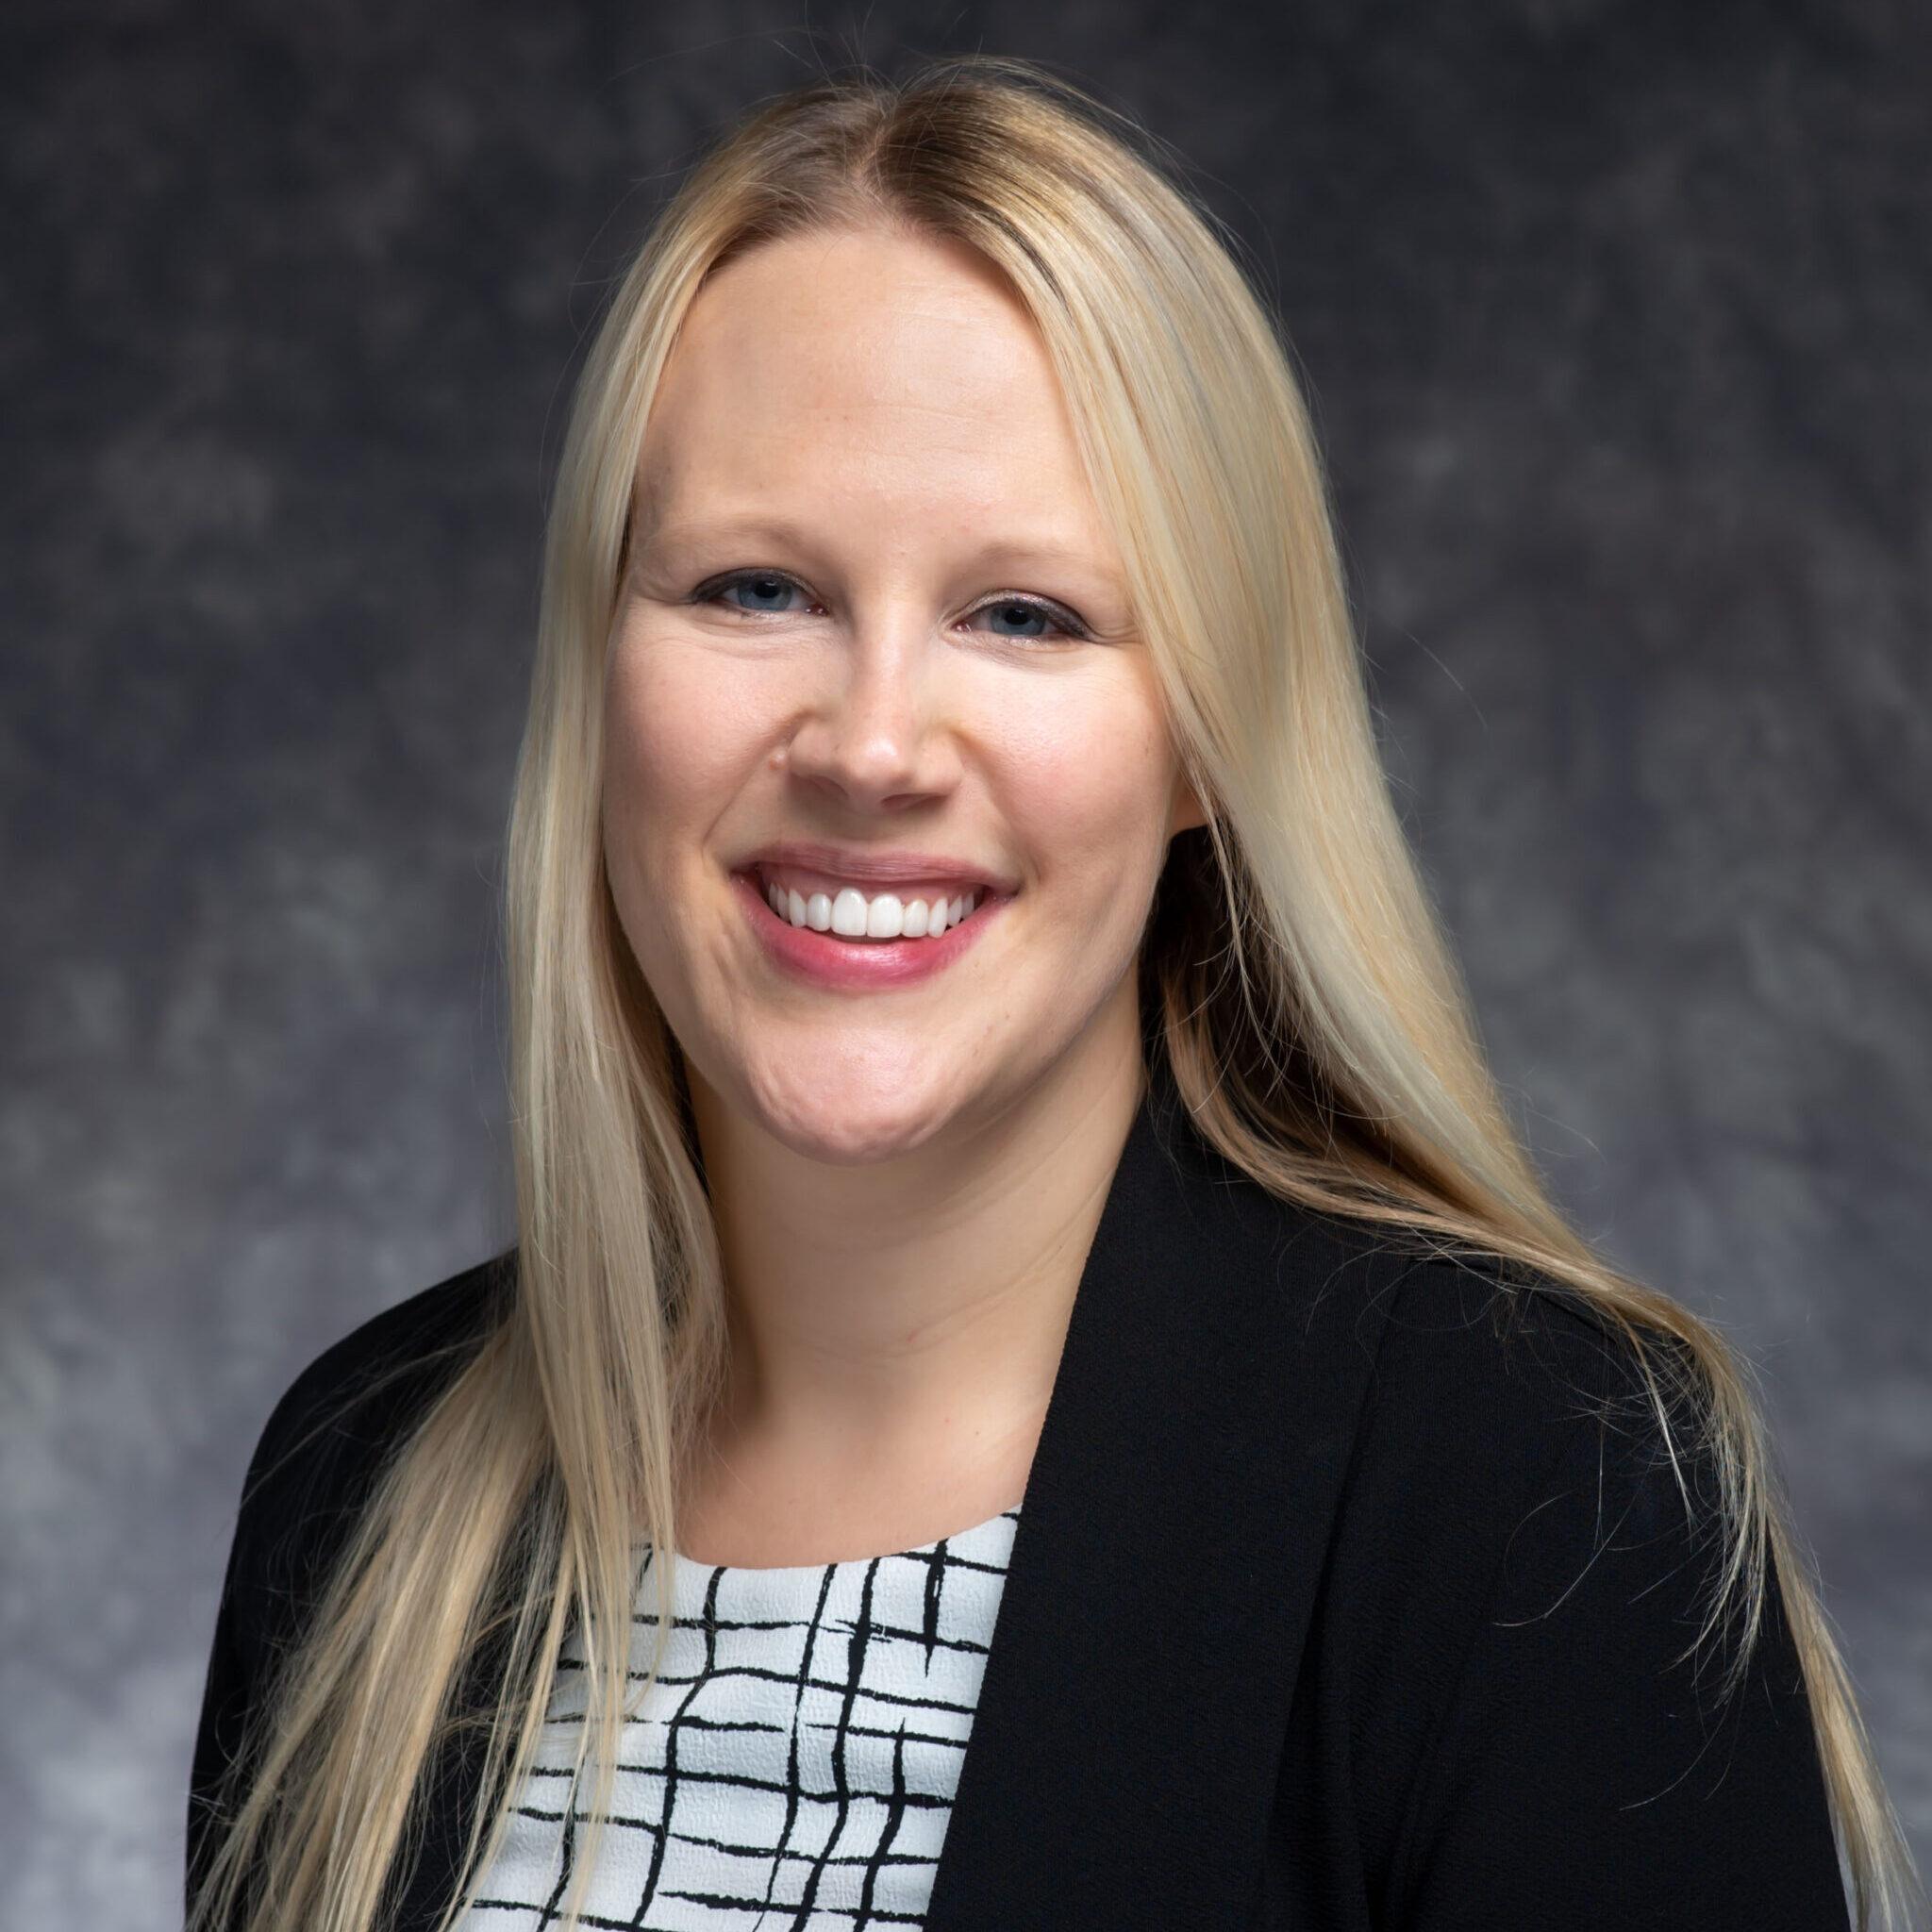 Hollie Nyseth Brehm, JMVR Editorial Board Member